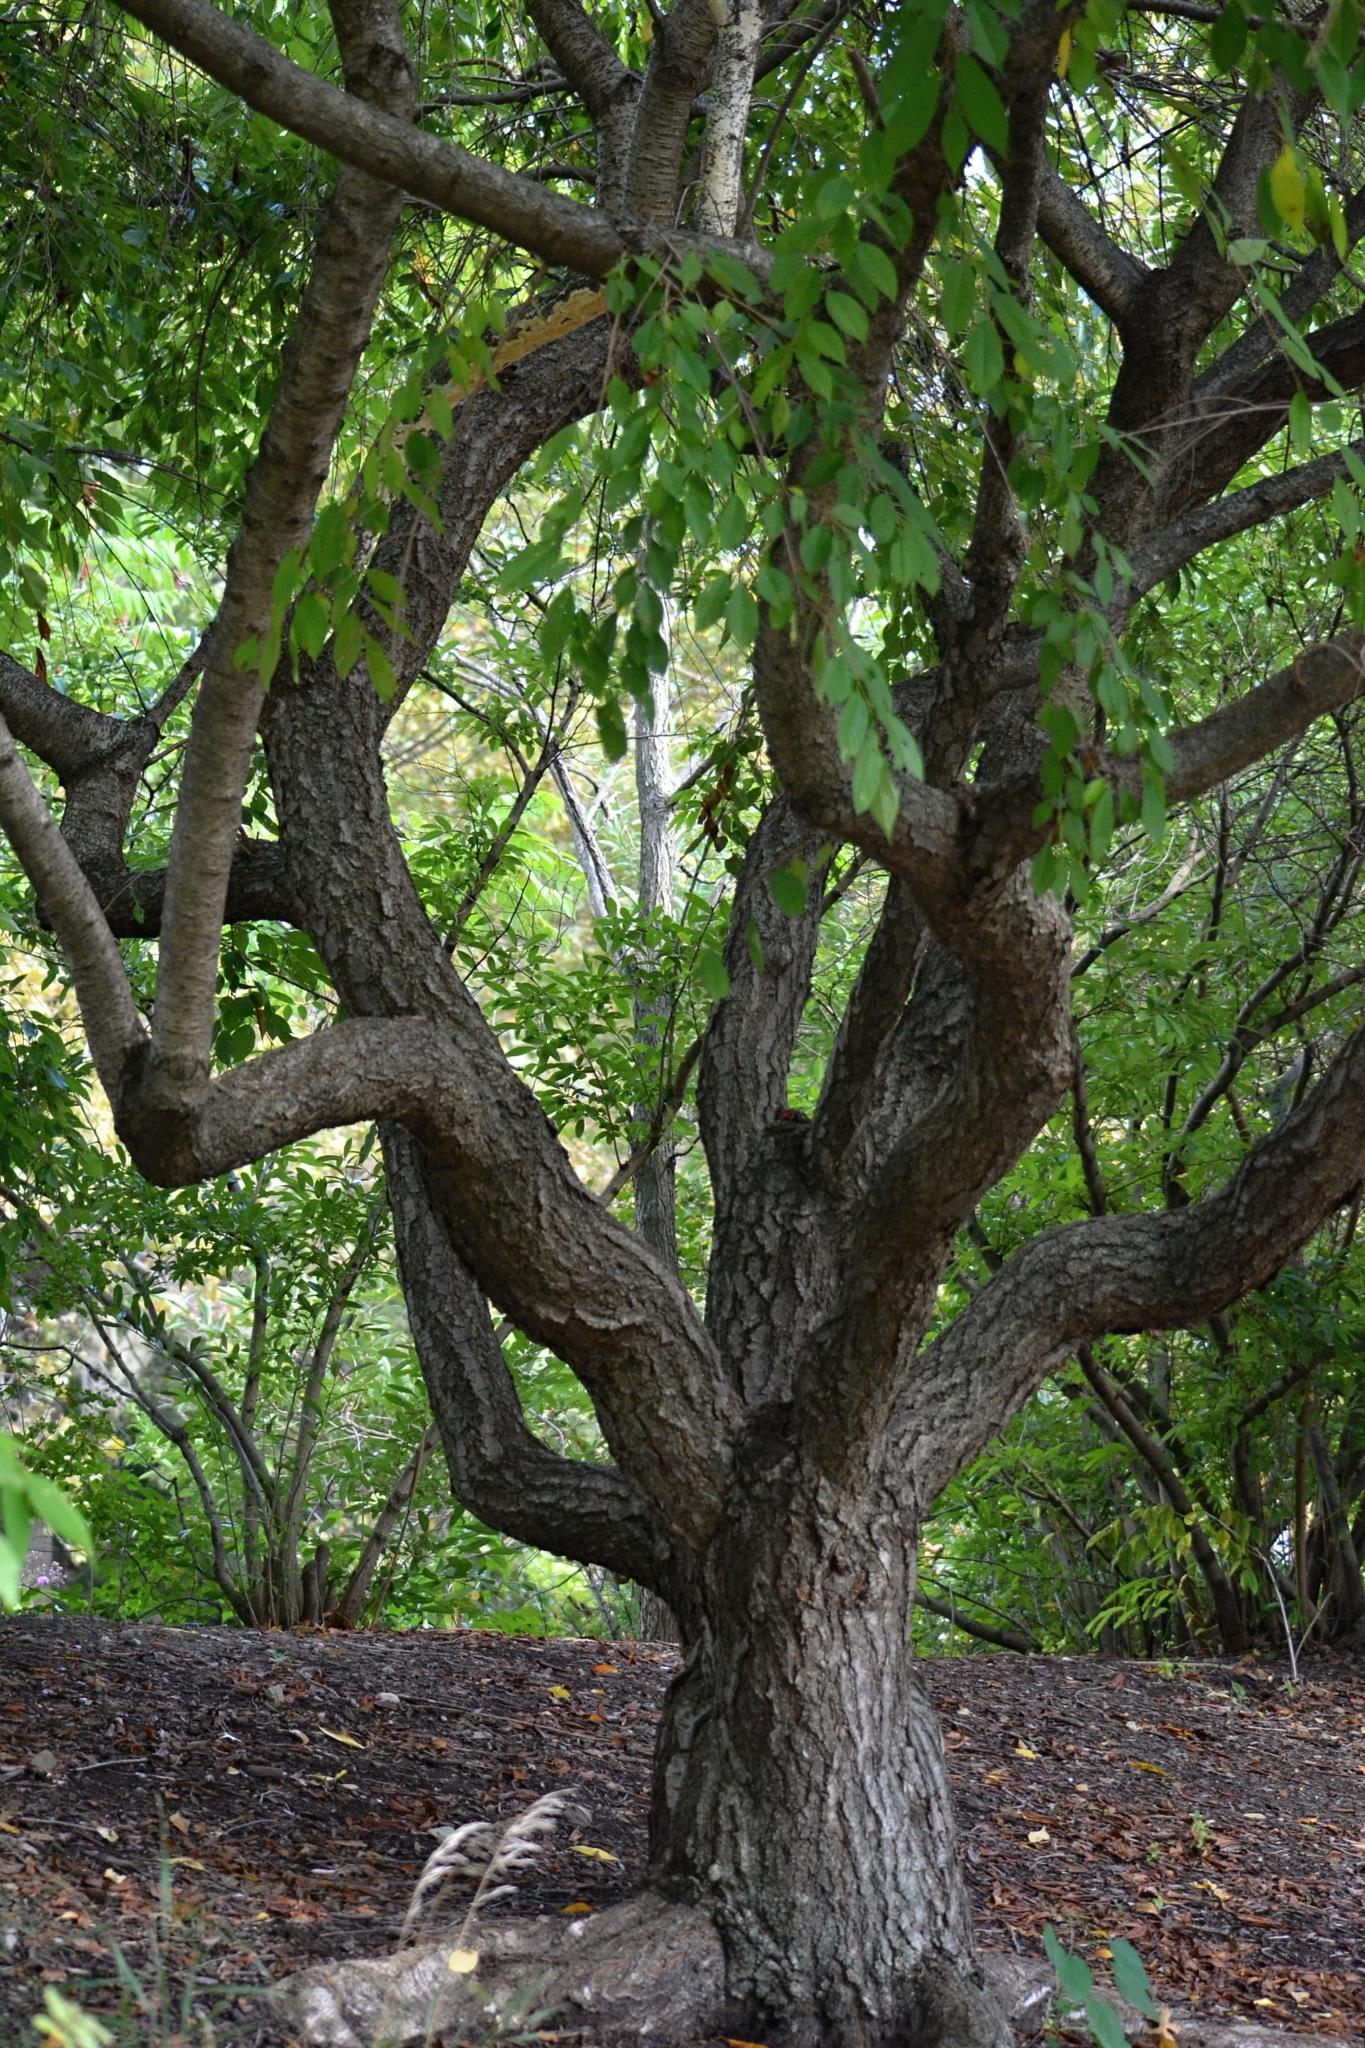 A Gnarled Tree by Renee Kennedy